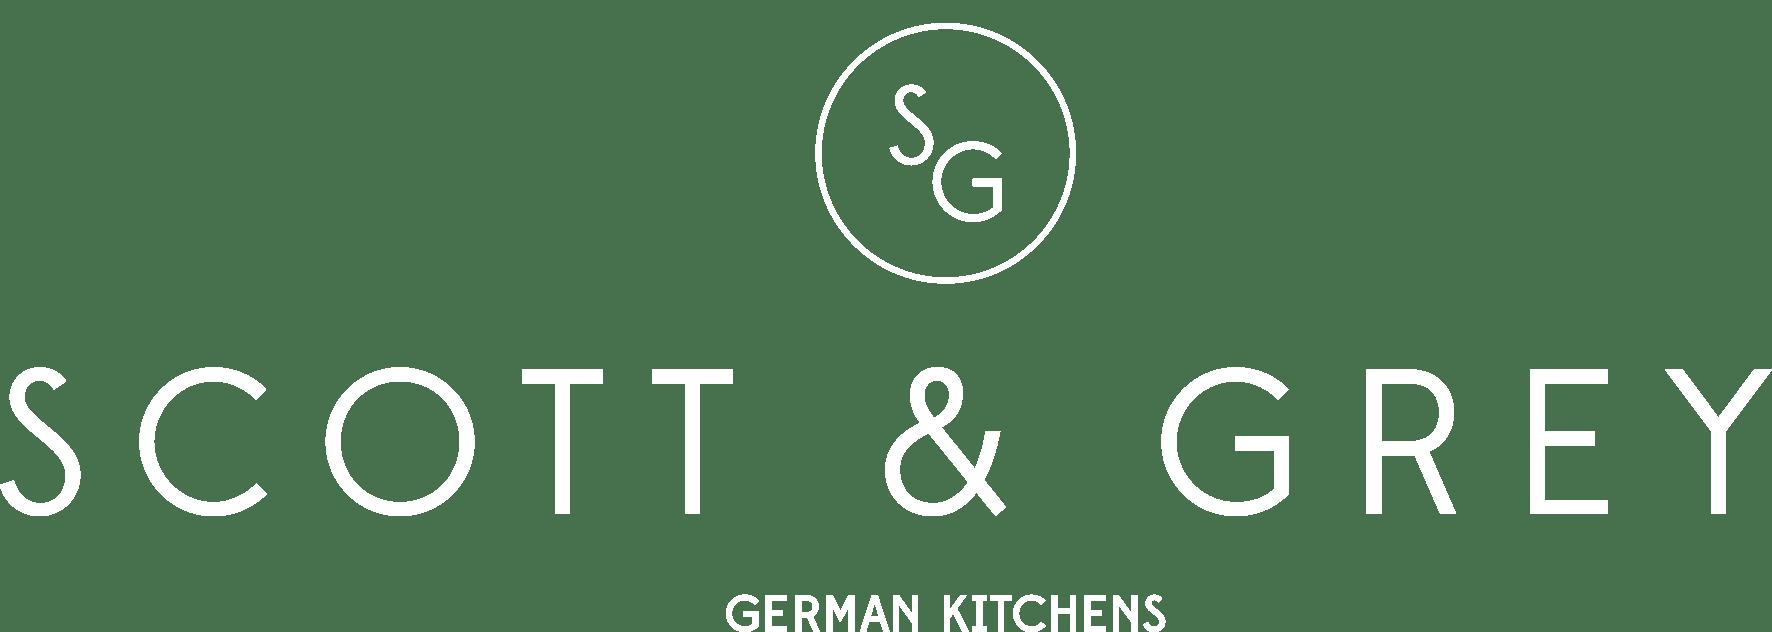 Scott and Grey German Kitchens Edinburgh